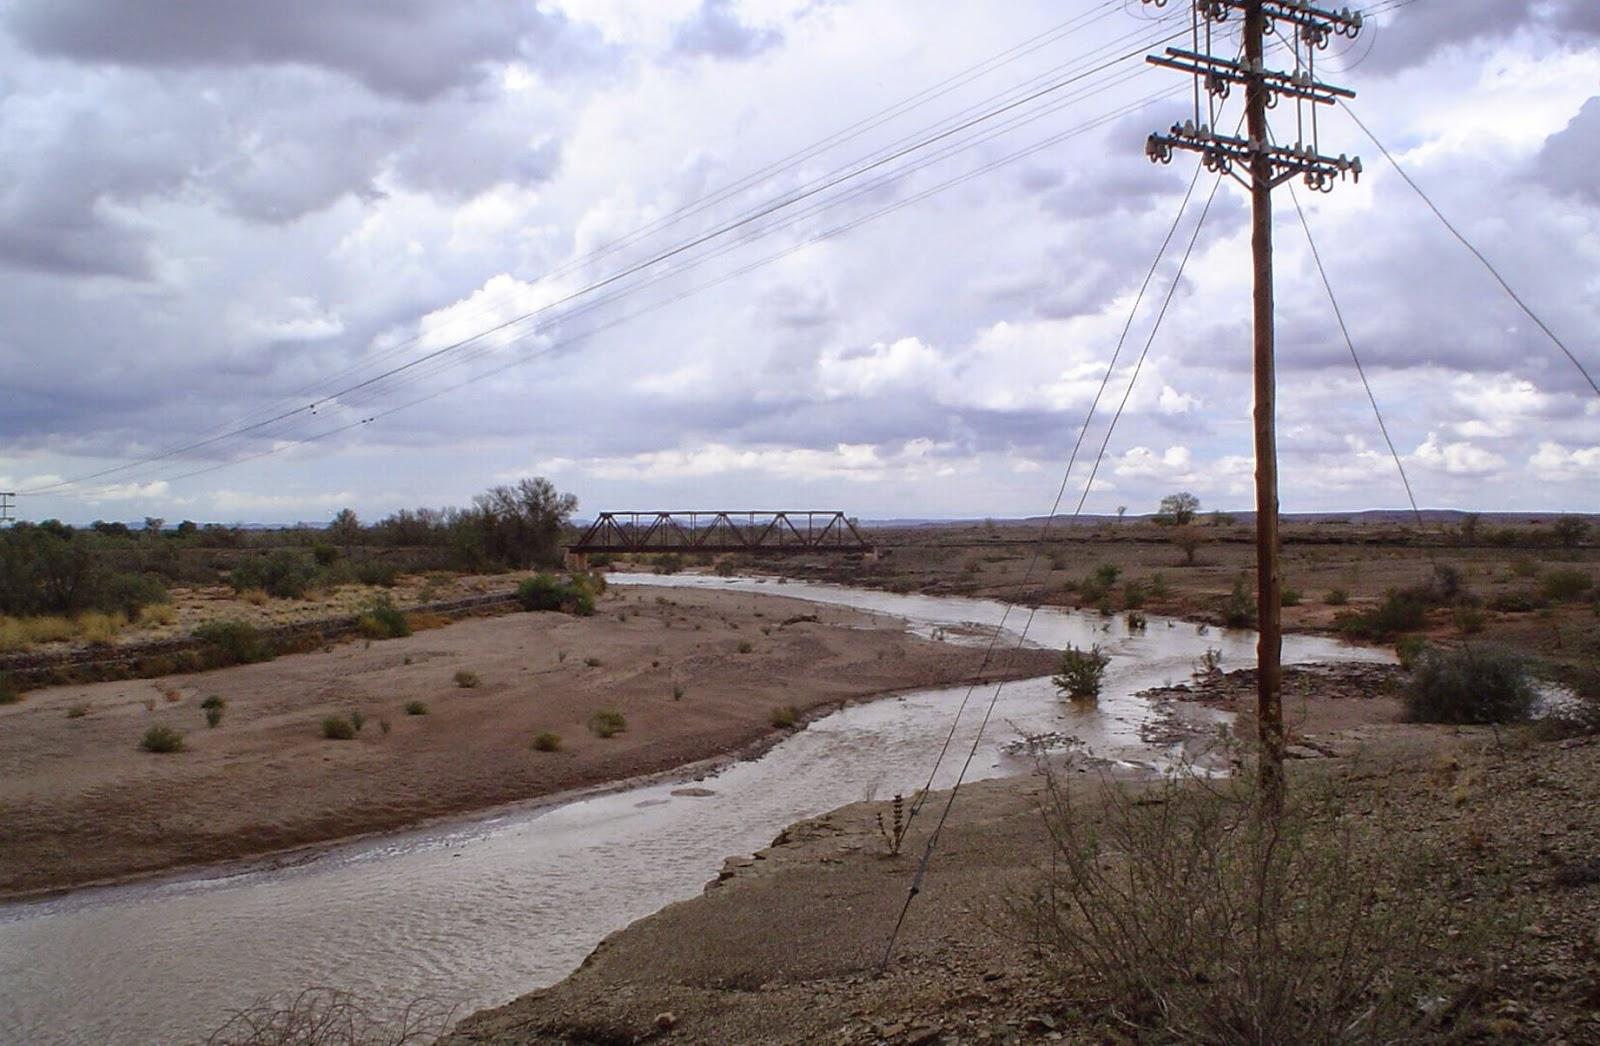 Rivers in Namibia - www.namibweb.com